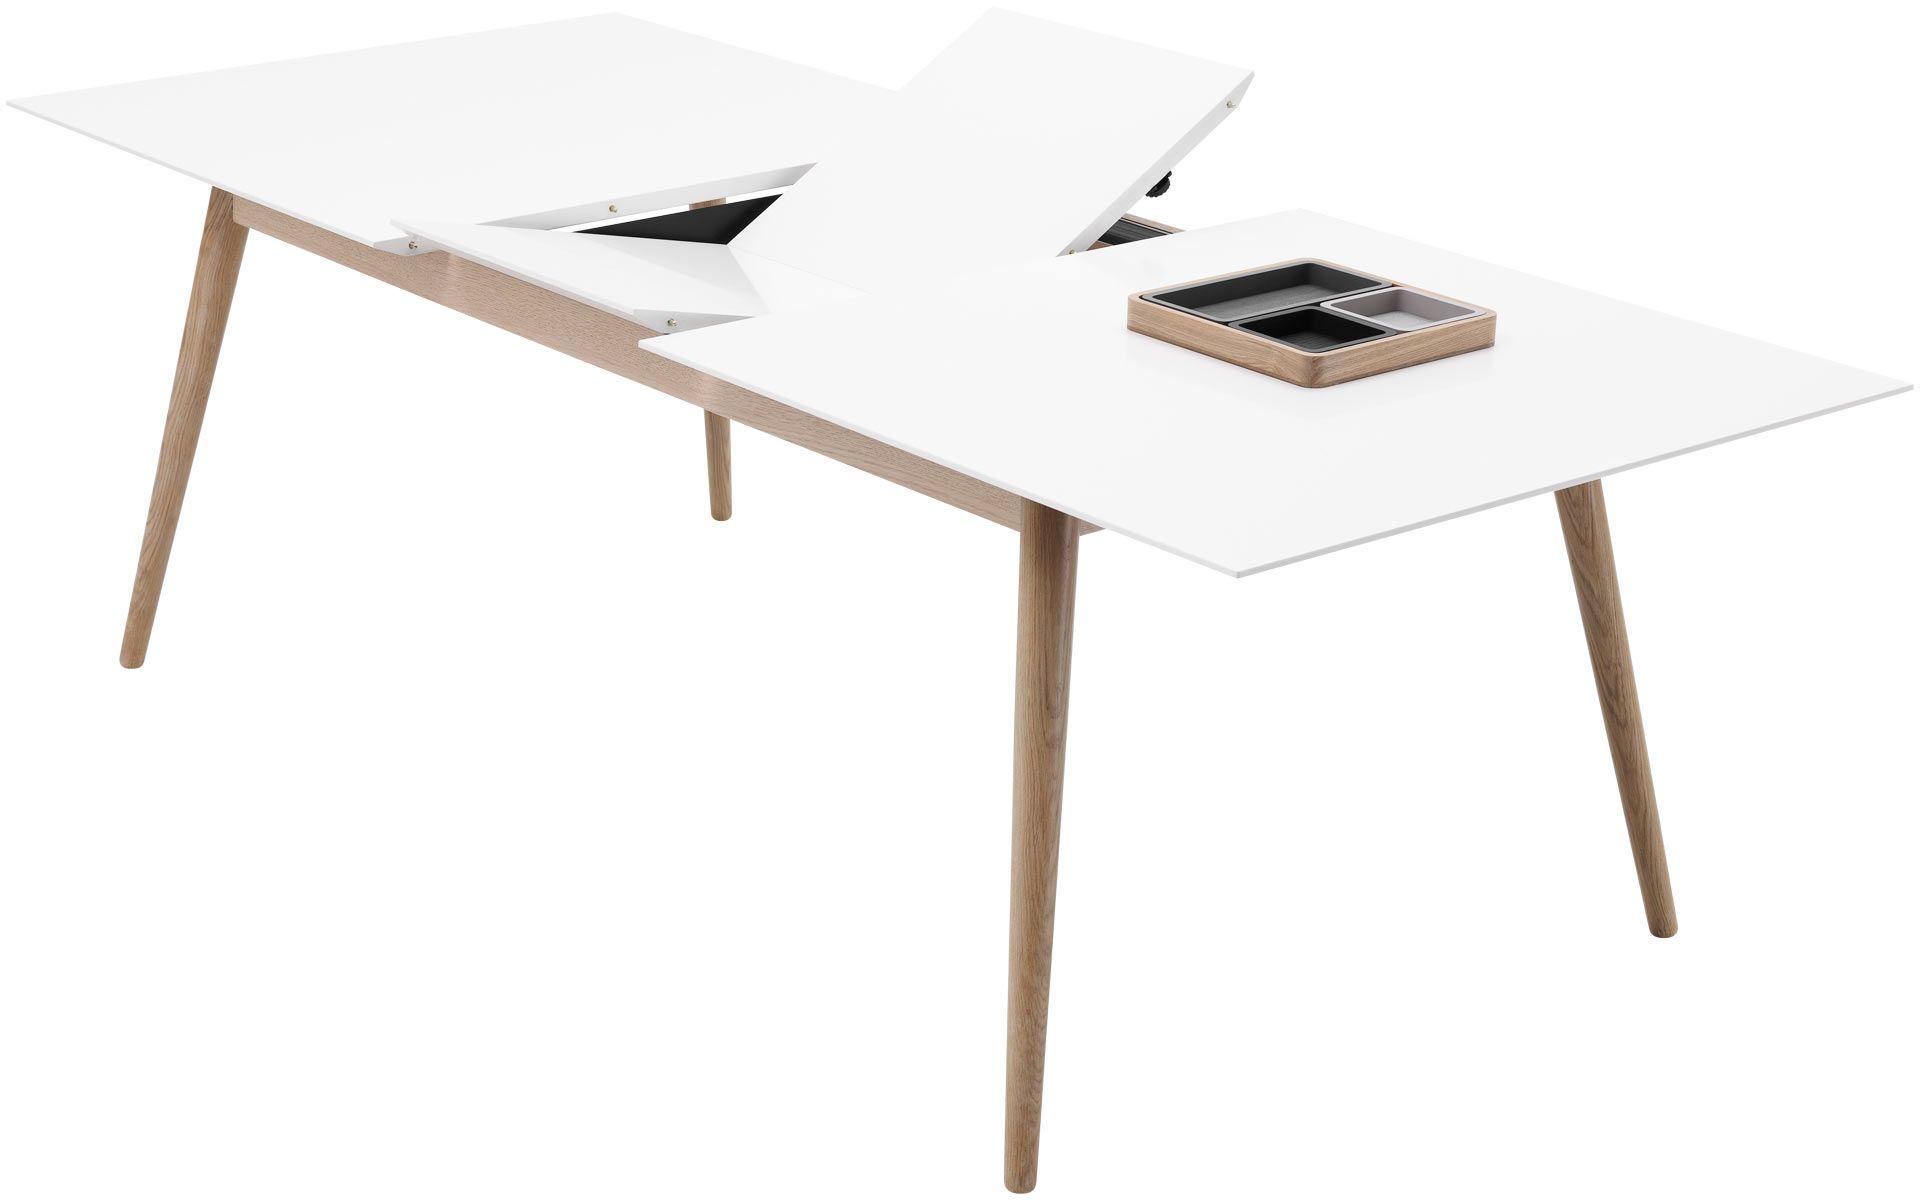 Simple Functional Scandinavian Design Esstisch Holz Ausziehbar